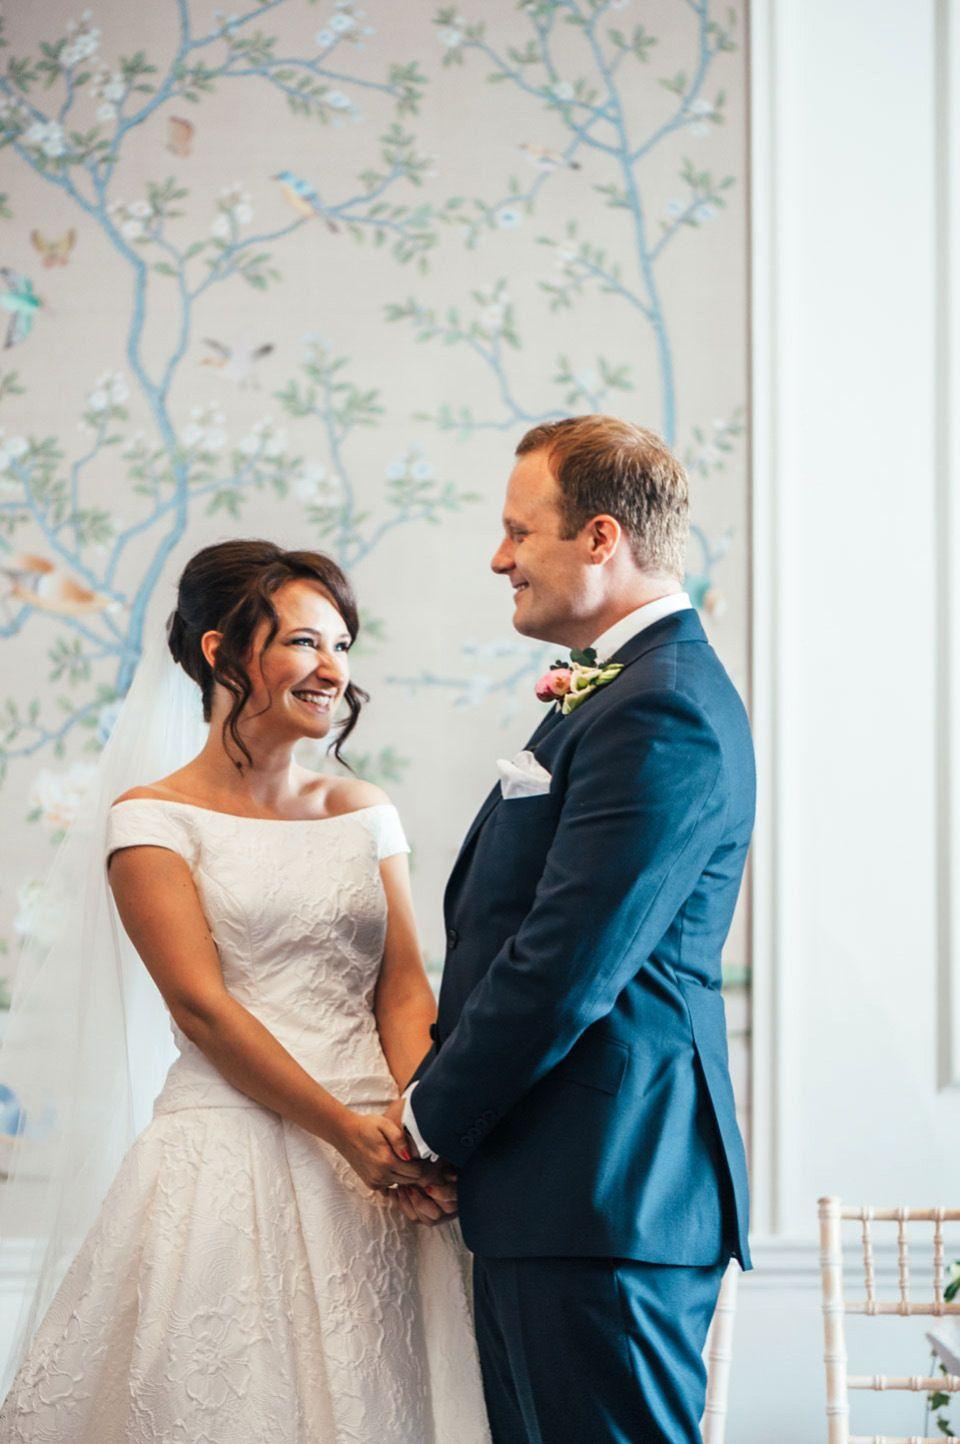 Raimon bundo elegance and maids in pretty pale blue wedding dress